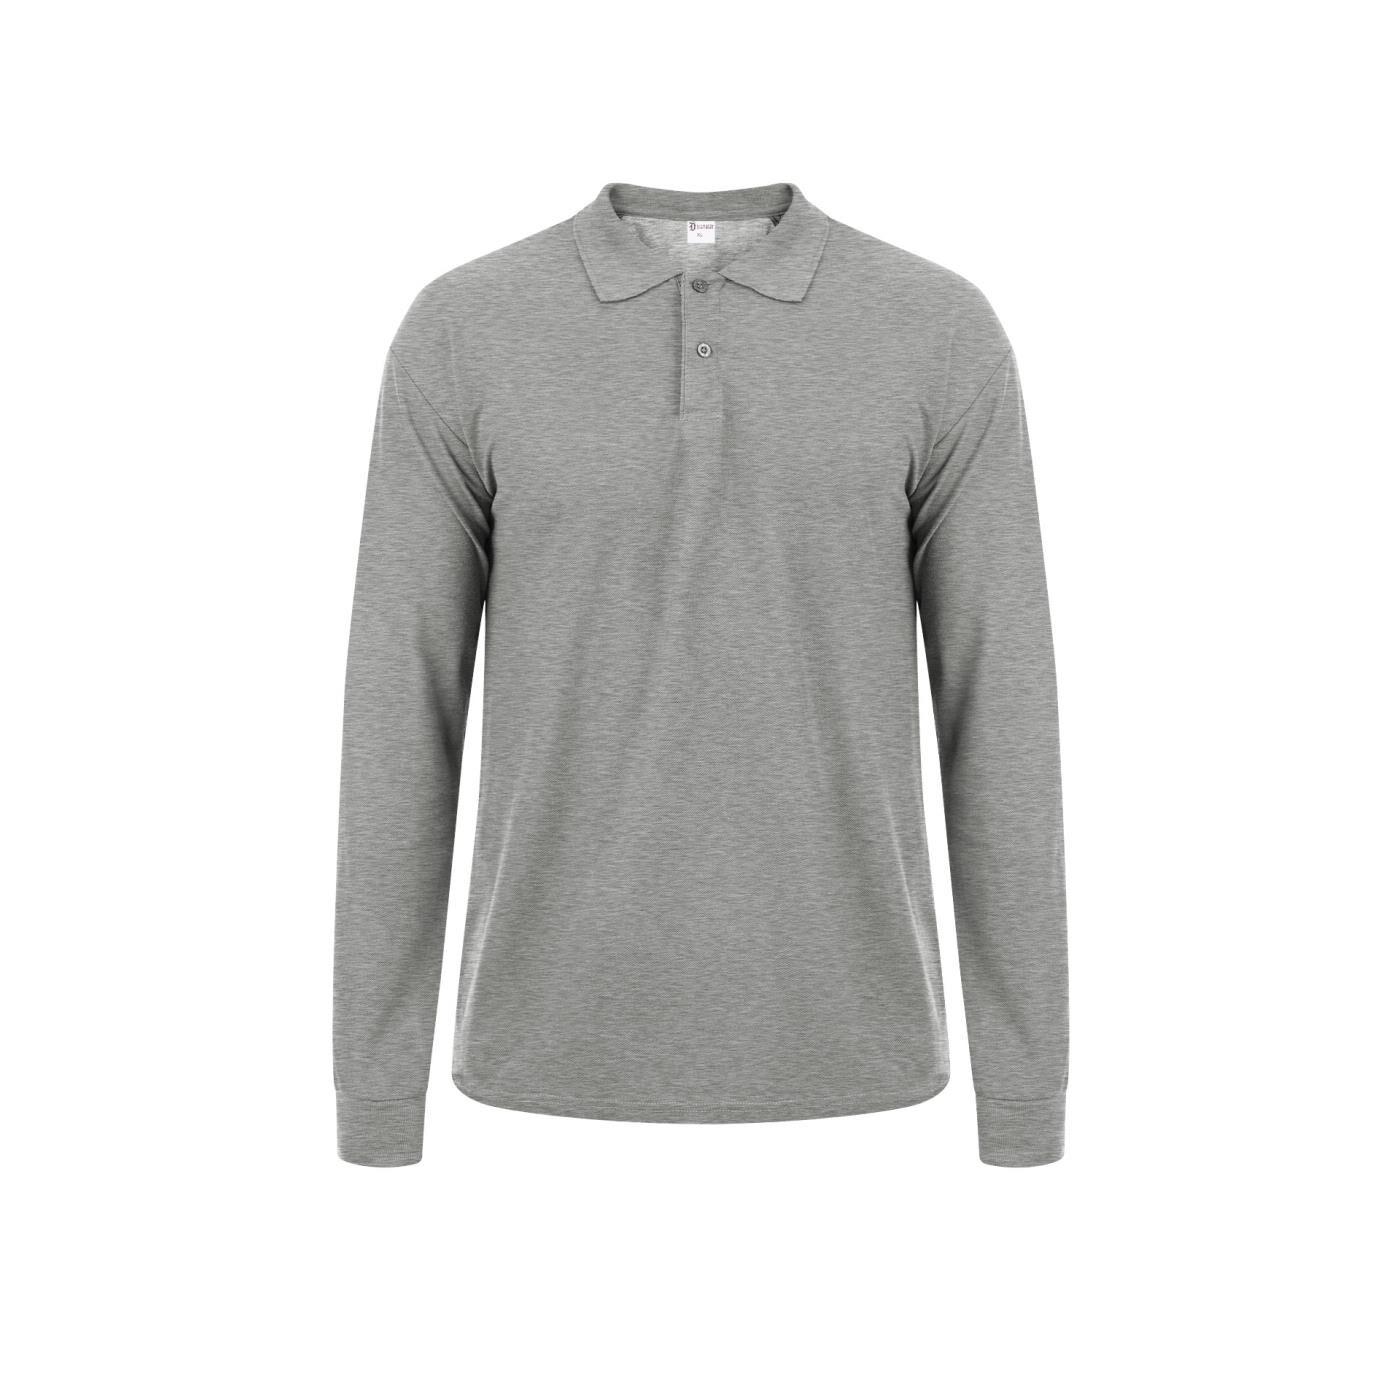 Celestino Ανδρική μπλούζα με γιακά  - Γκρι - Grootte: Small